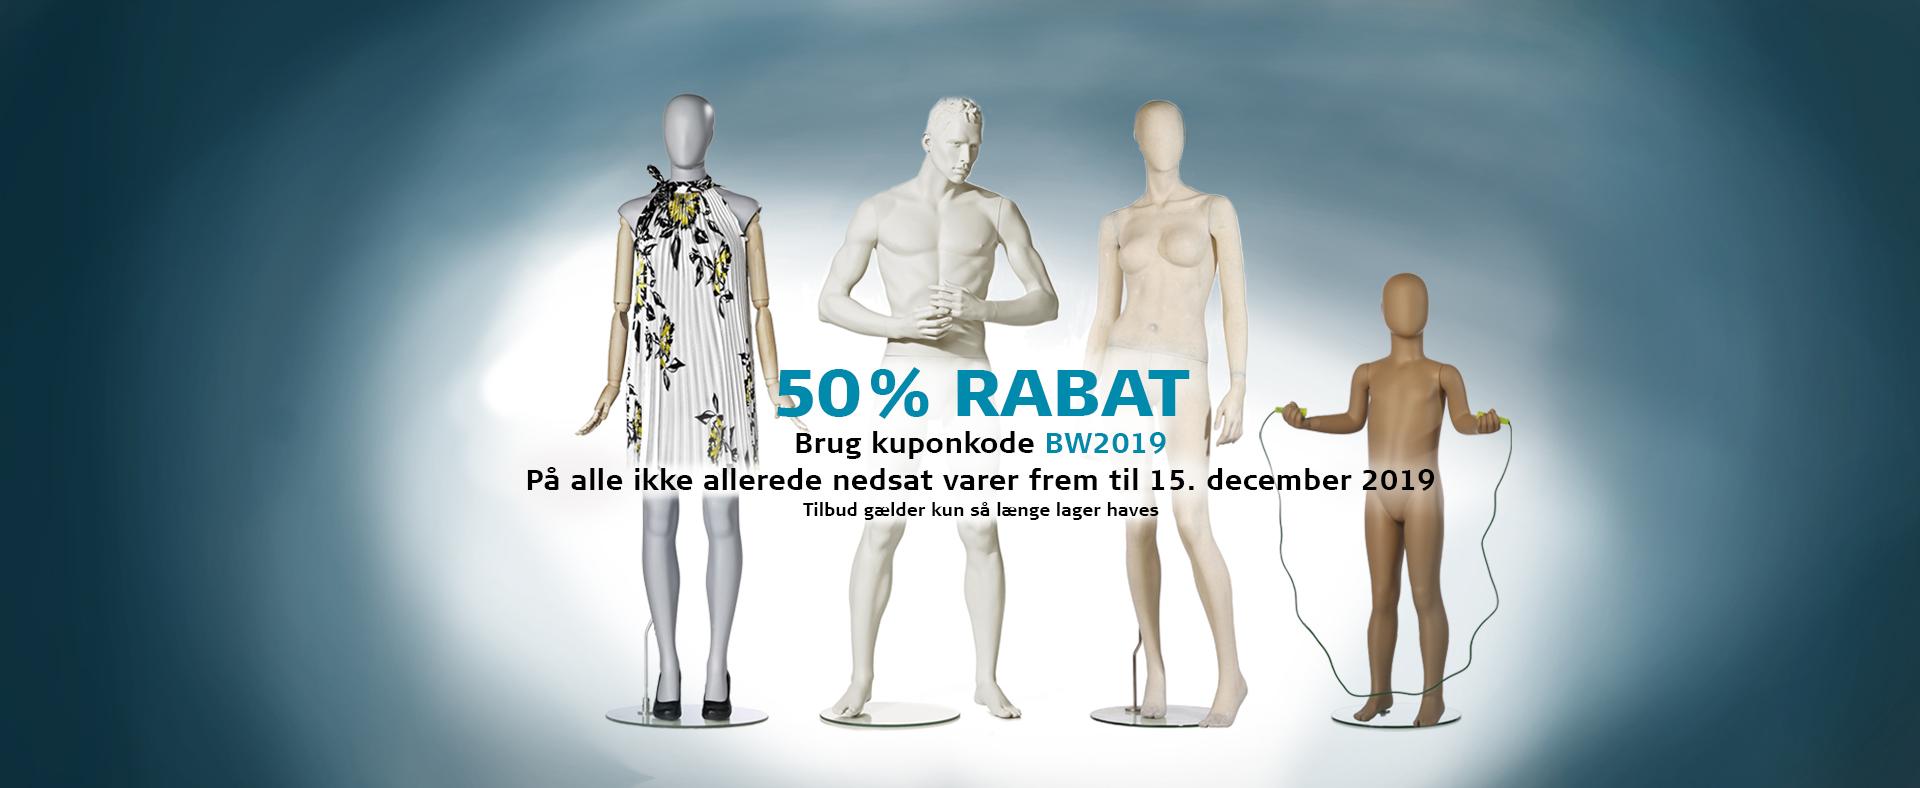 DK4-mannrquins-rabat